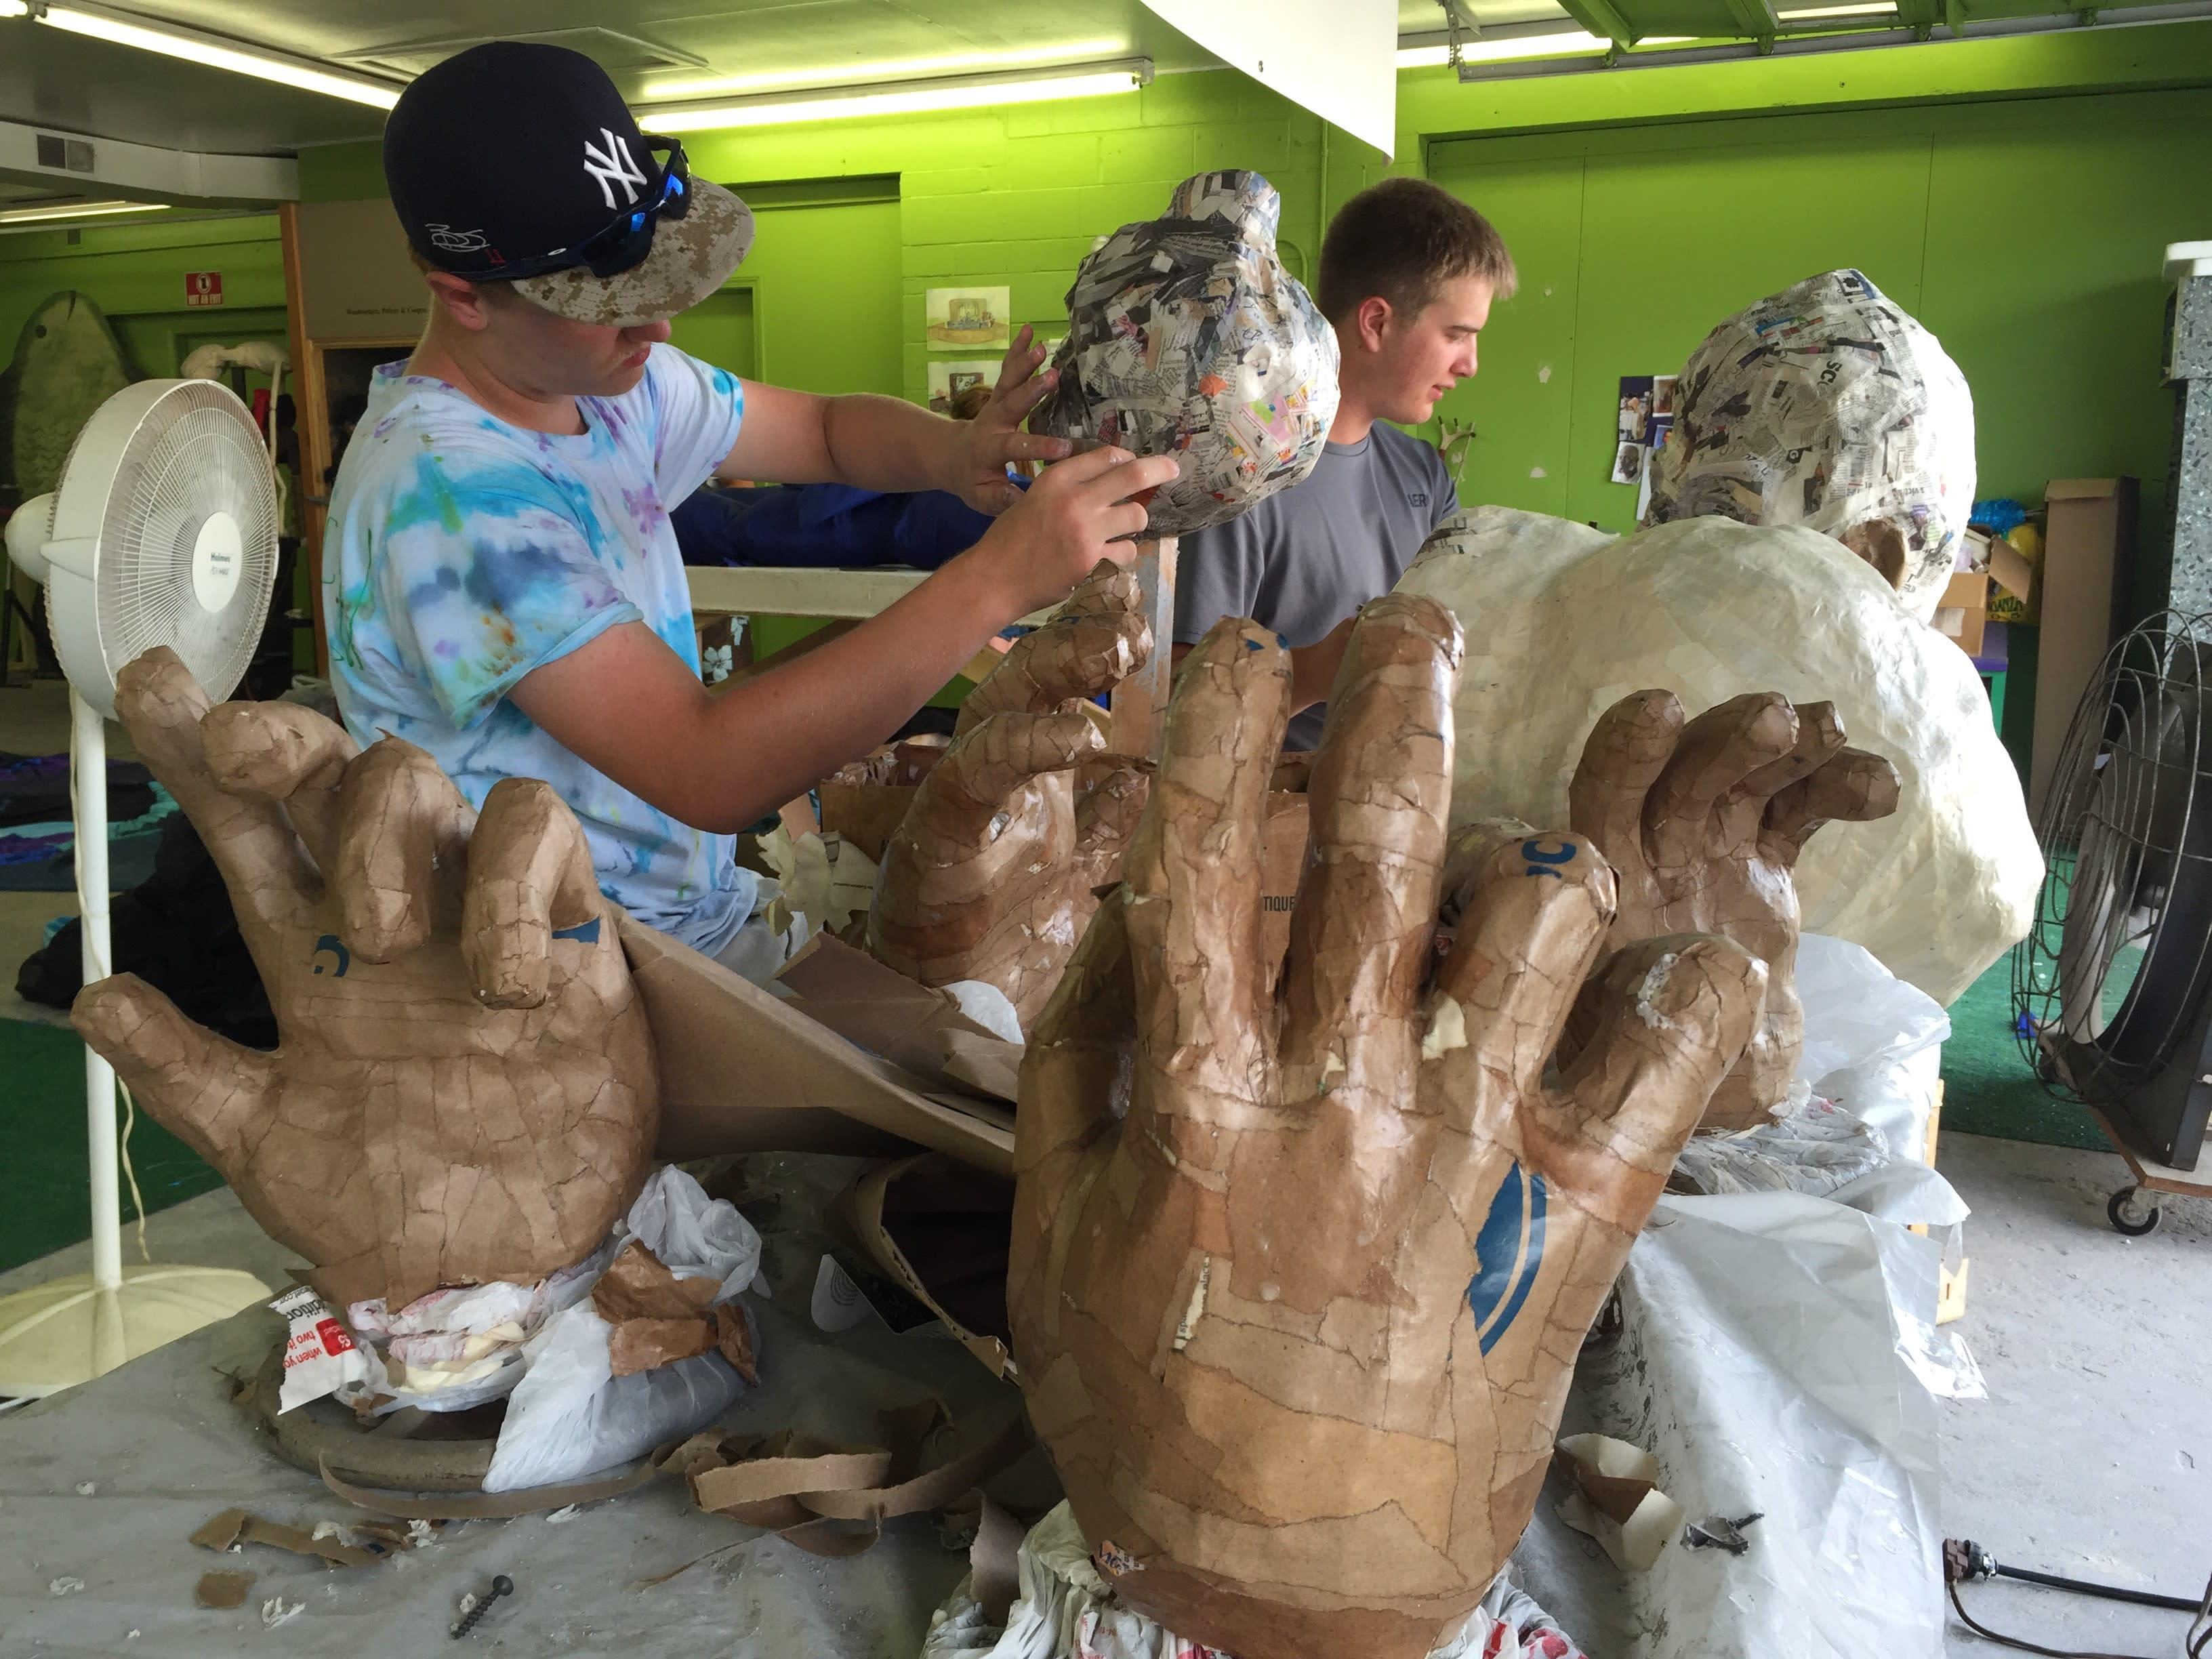 Puppet Show giant hands